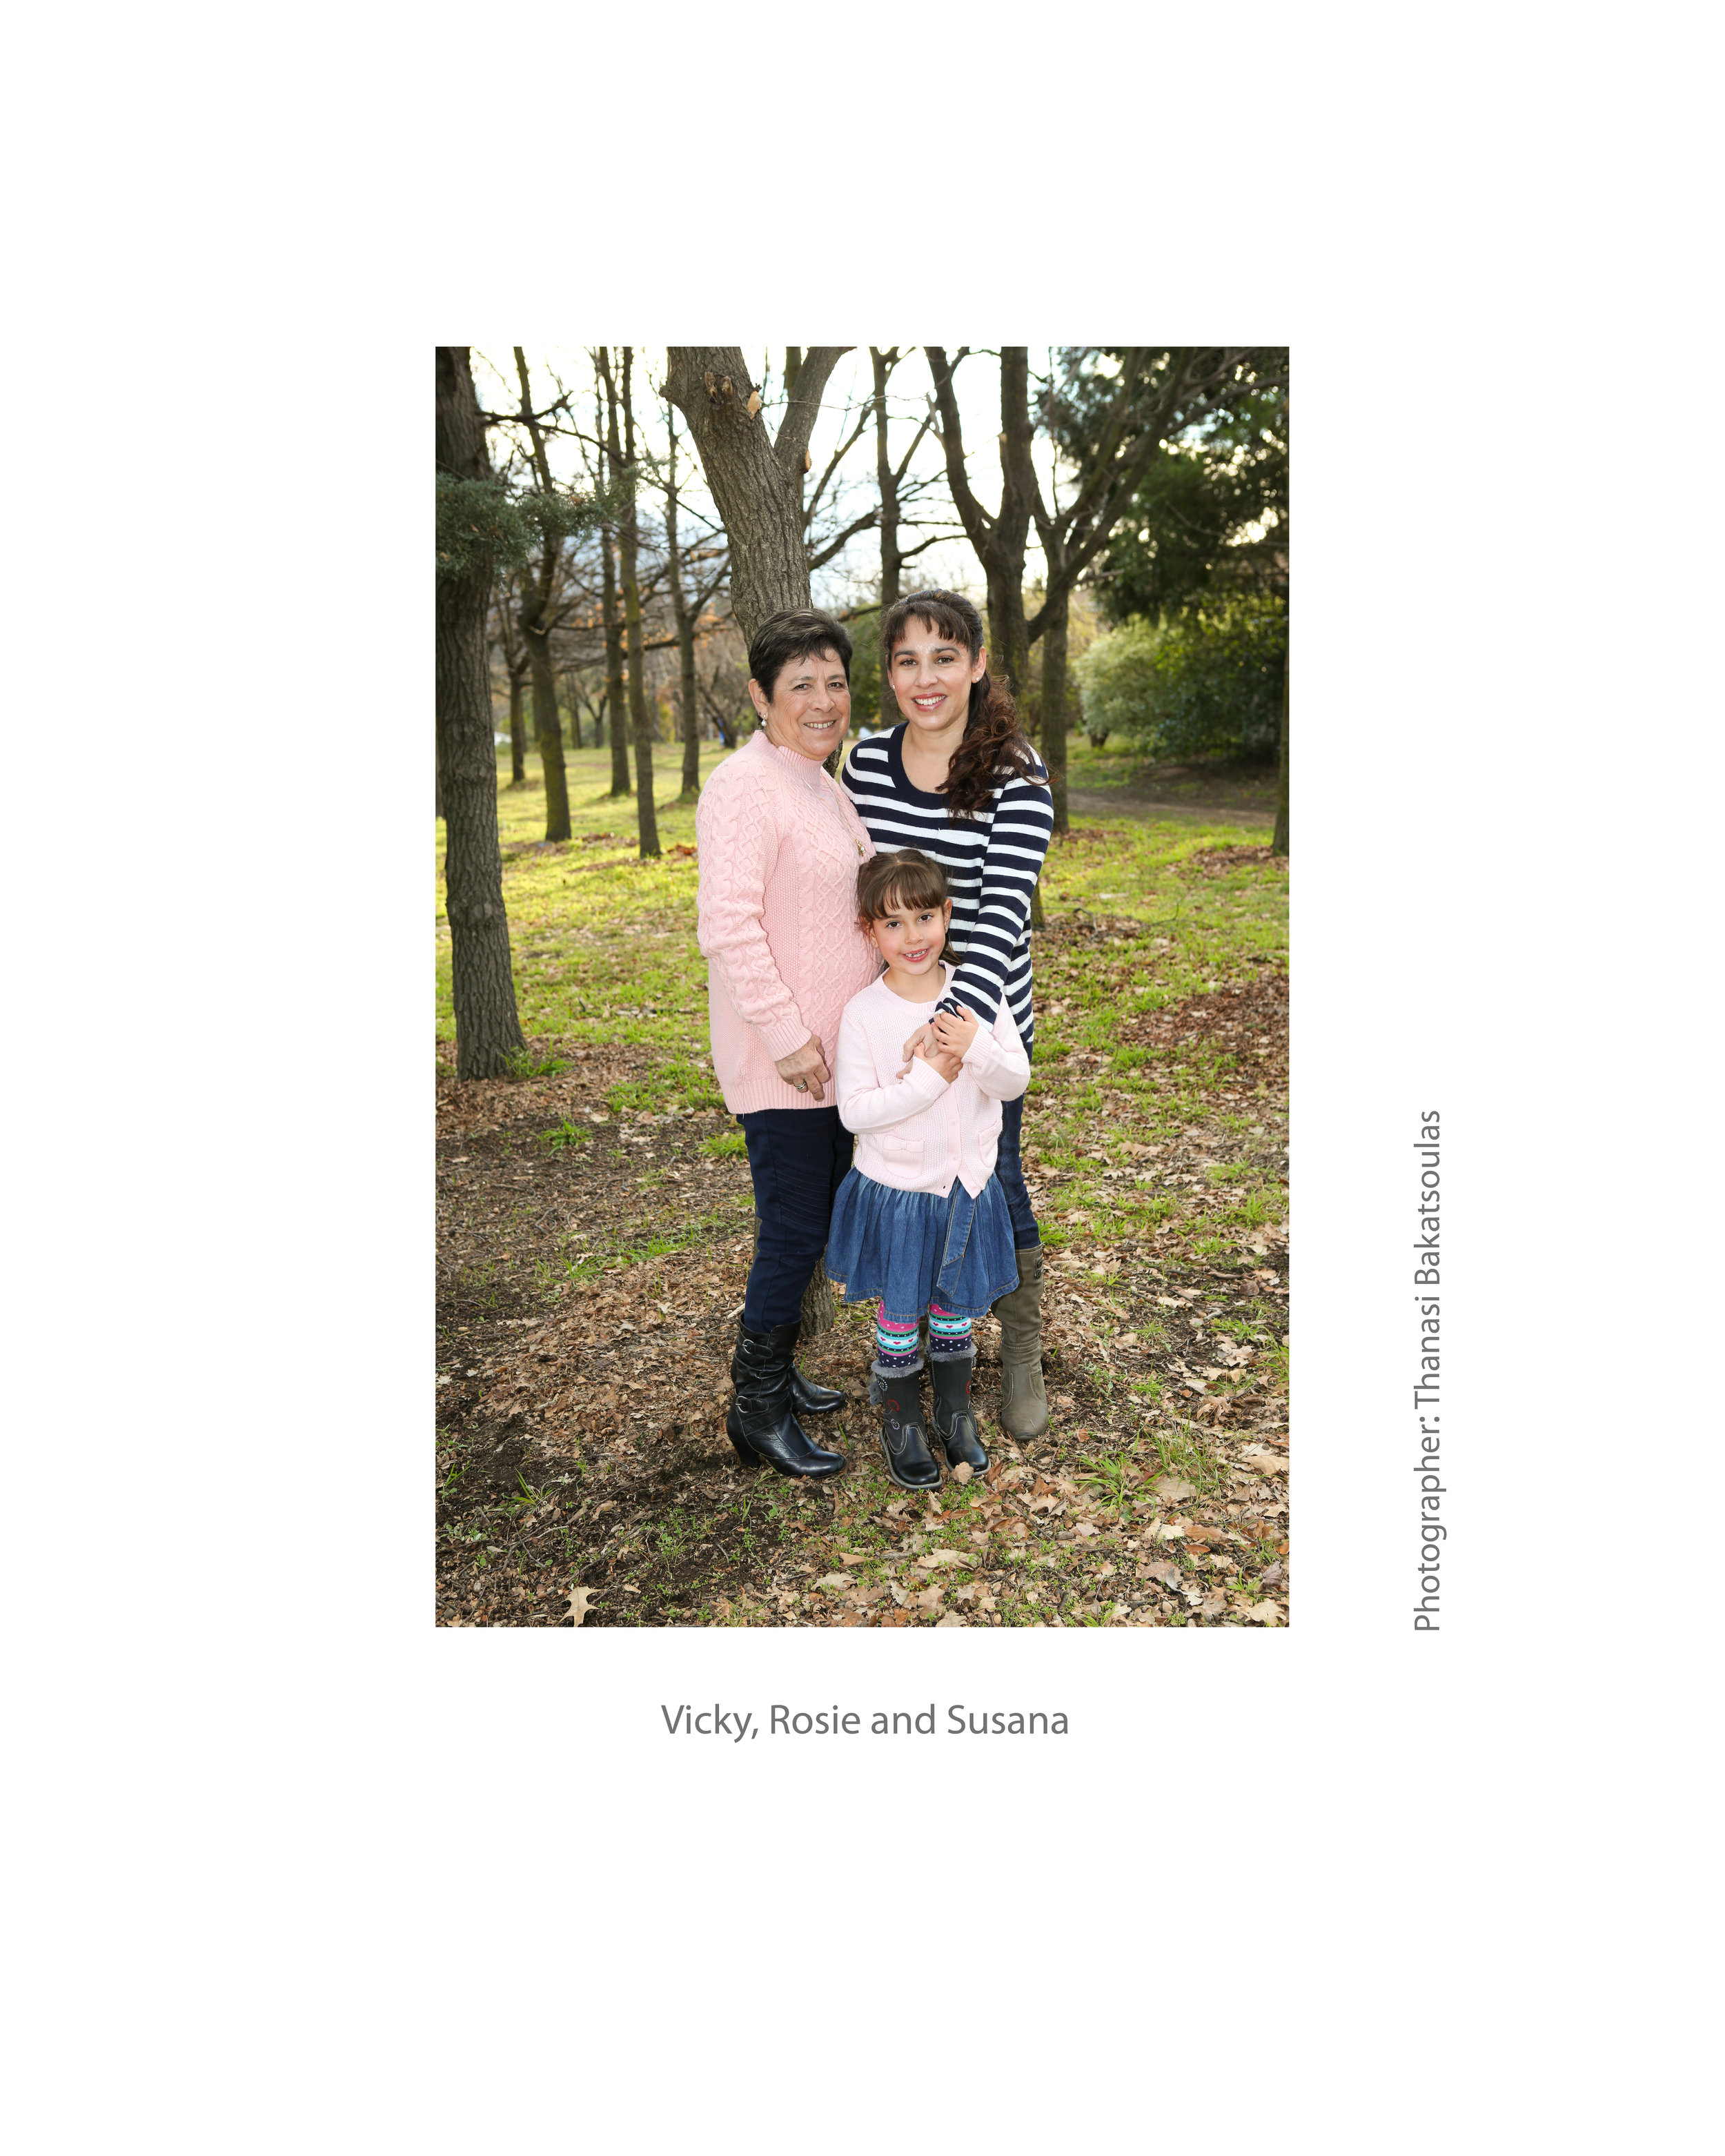 Vicly, Rosie and Susana.jpg